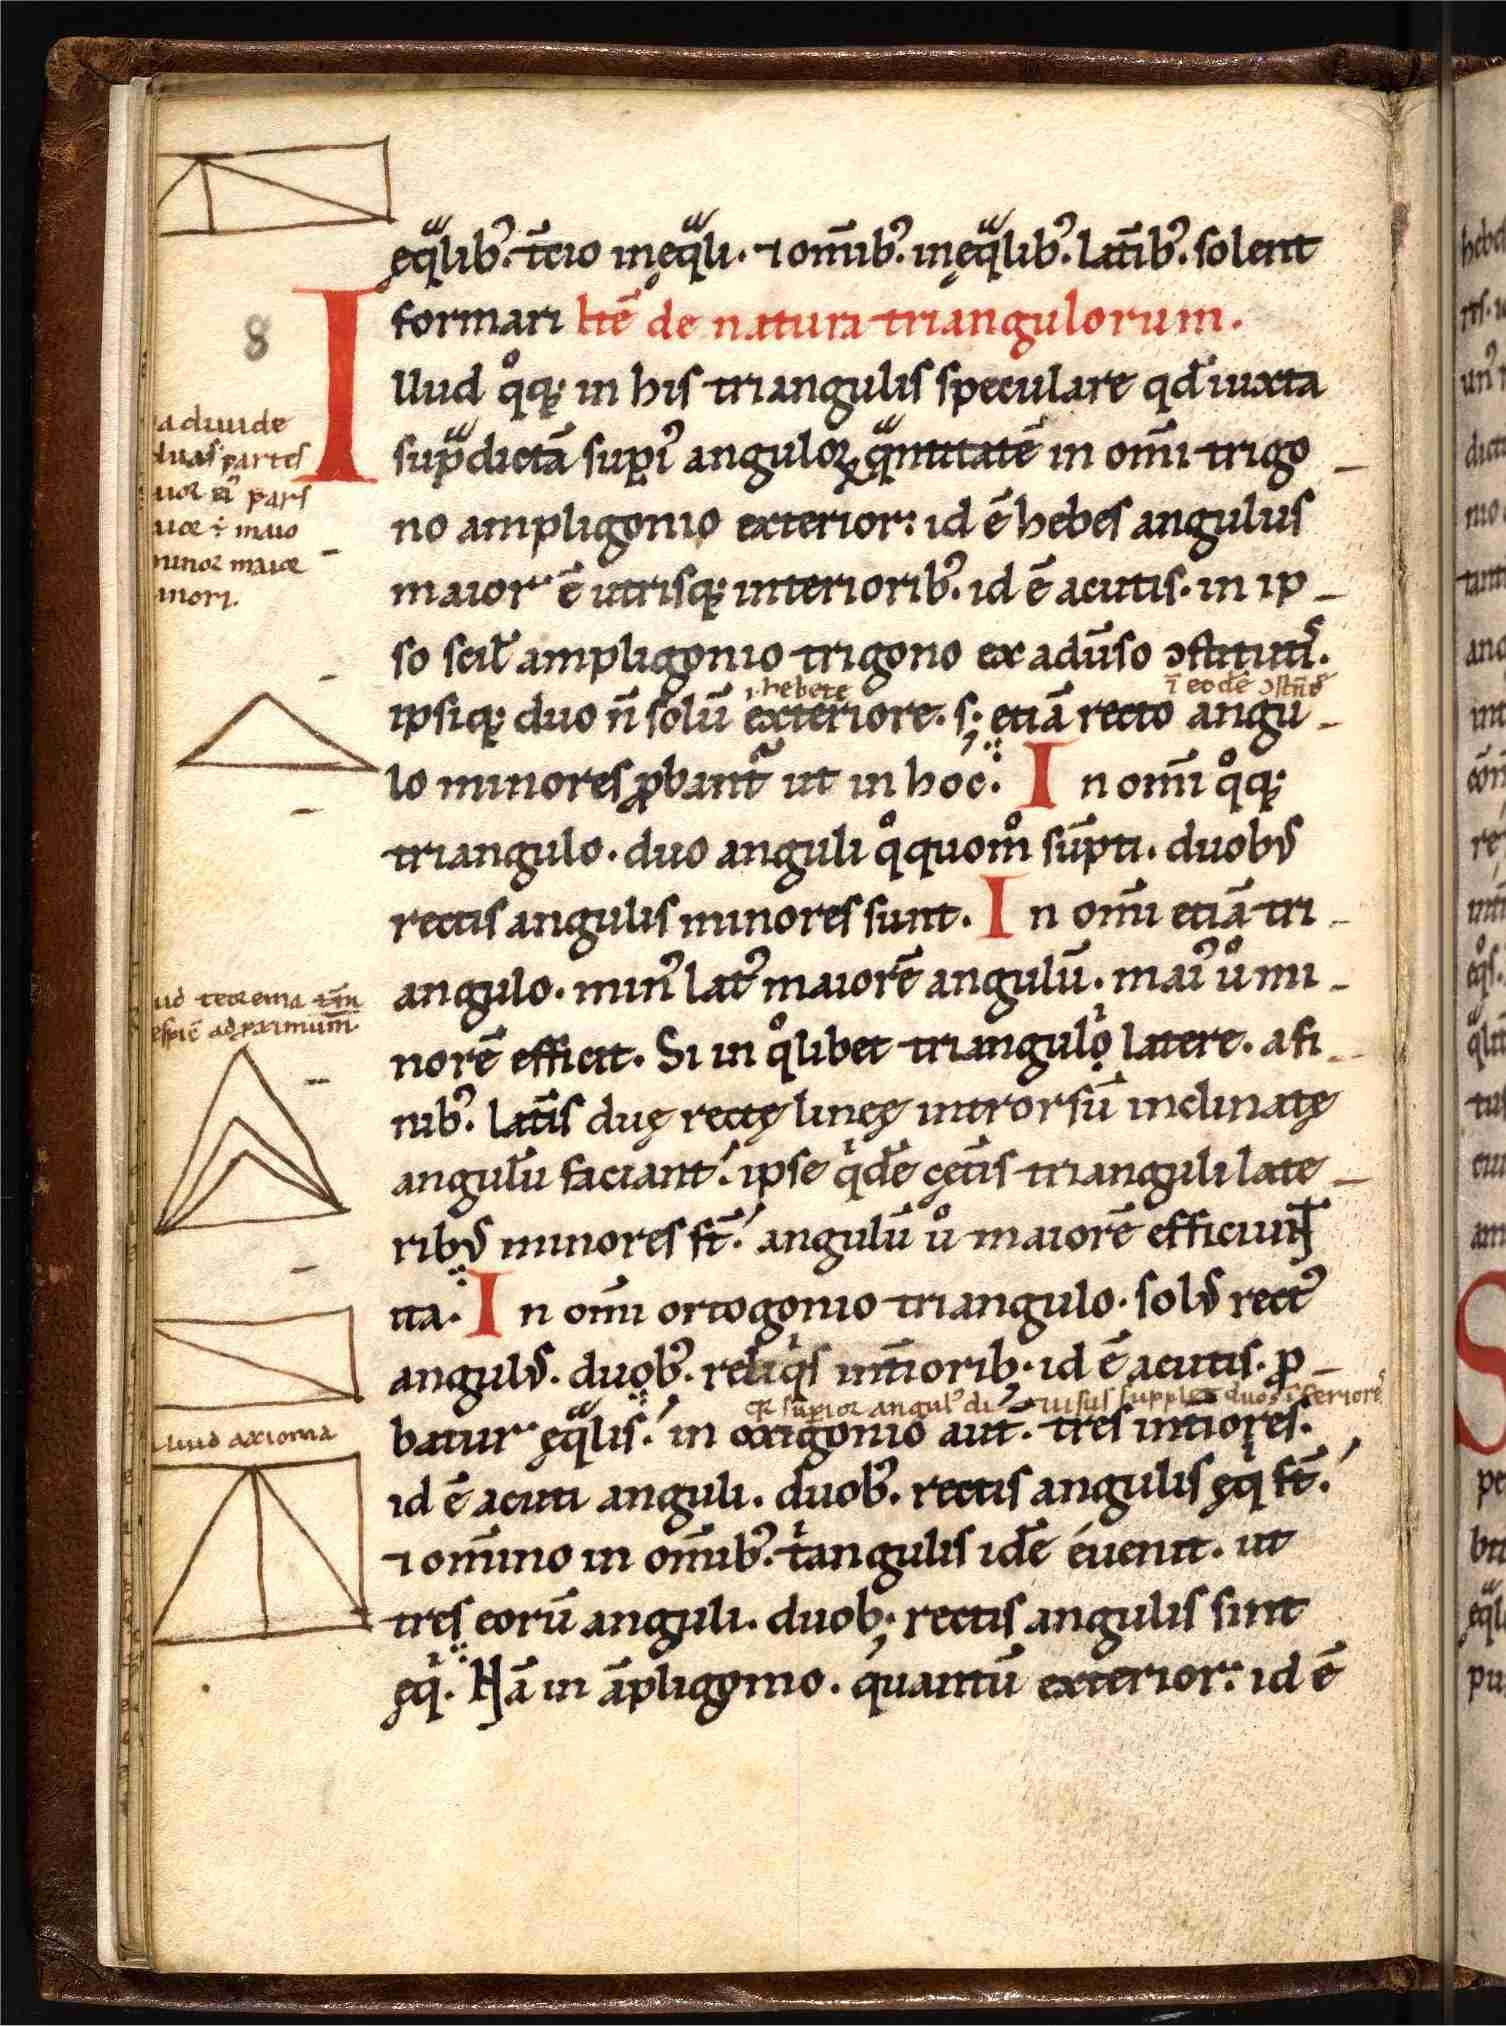 Pope_Sylvester_II_(Gerbert_d'Aurillac)_-_De_geometria